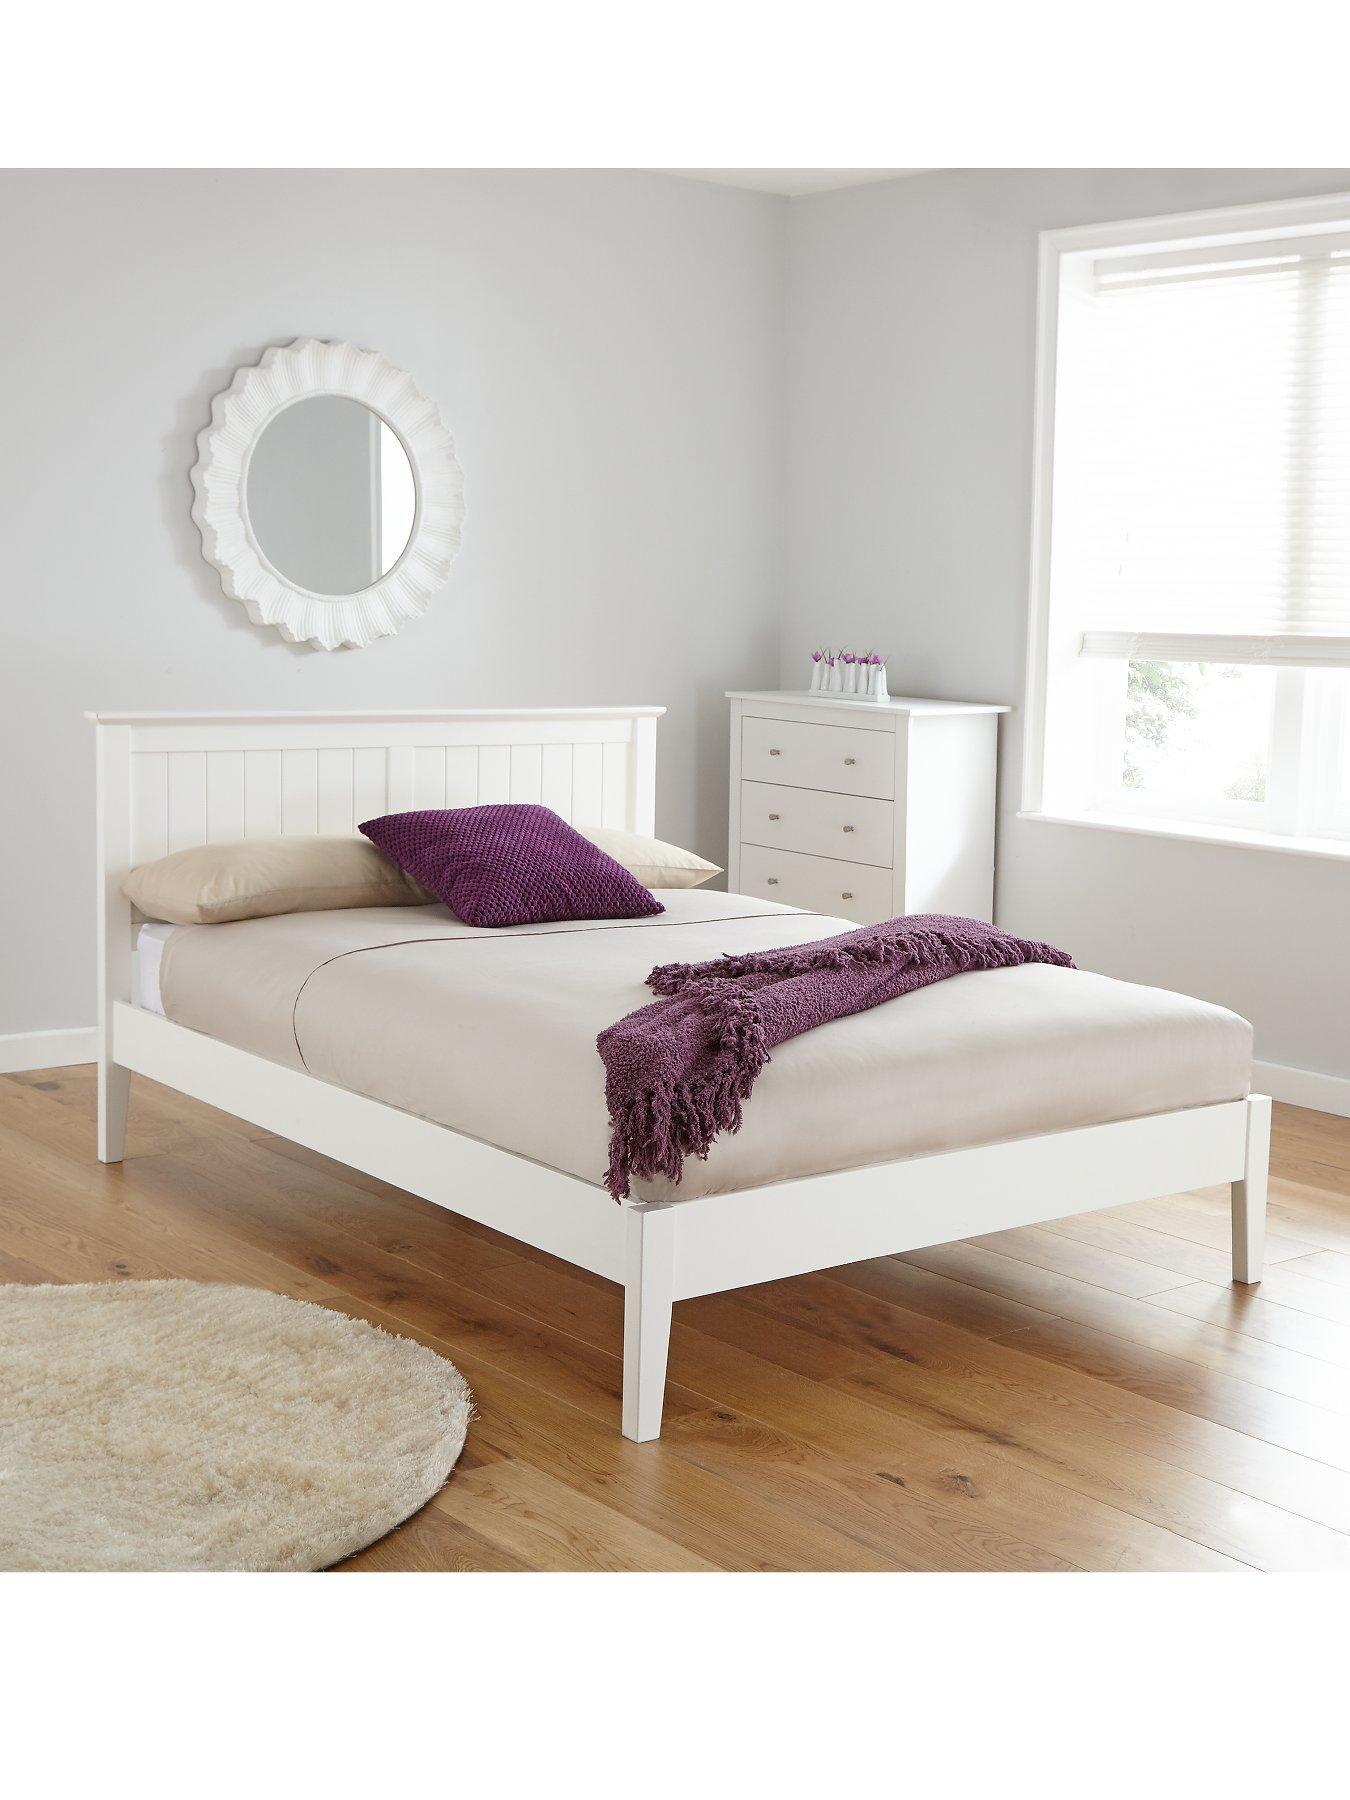 havana double bed frame h 96 2 w 148 d 203 cm mattress guide